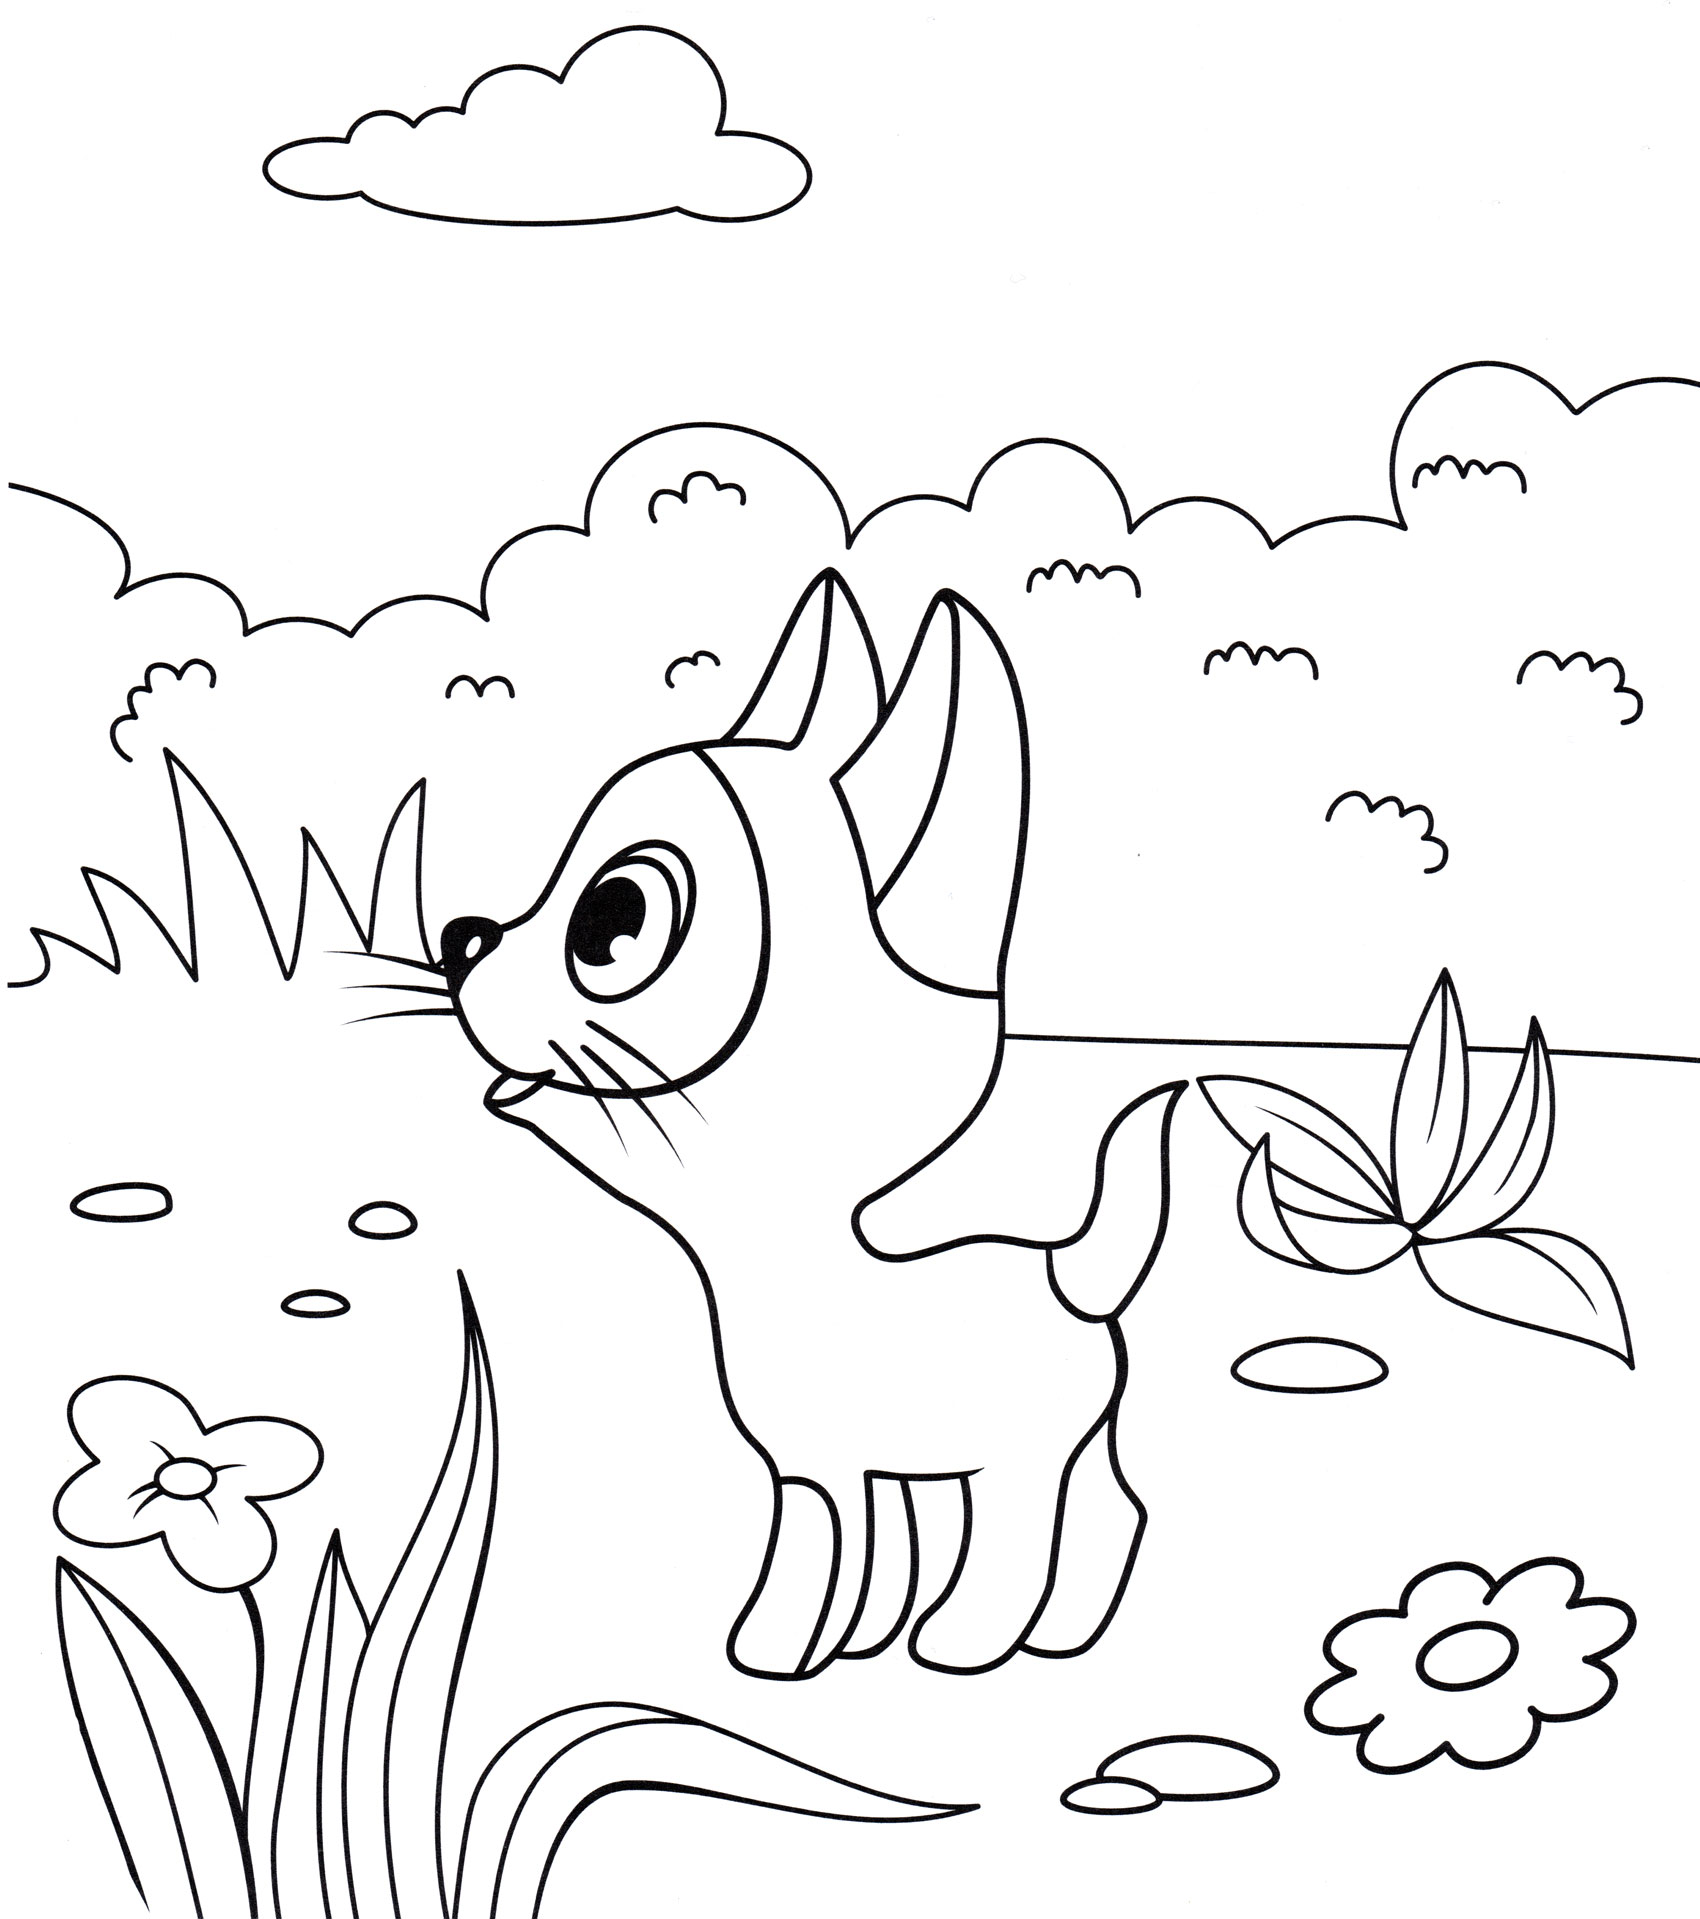 белоснежную картинки котенка гав карандашом это